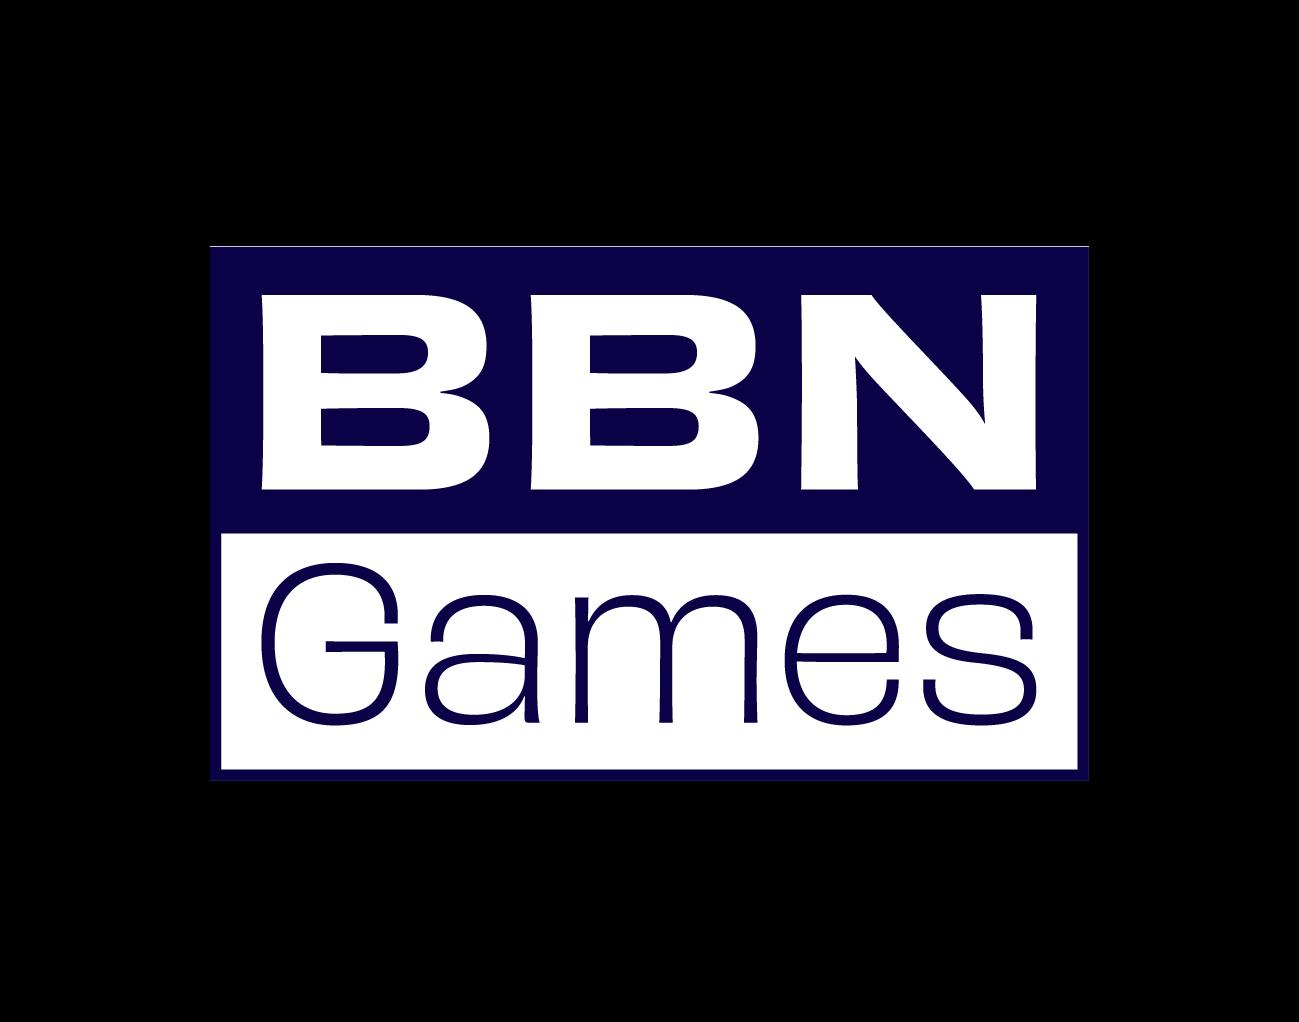 BBN Games